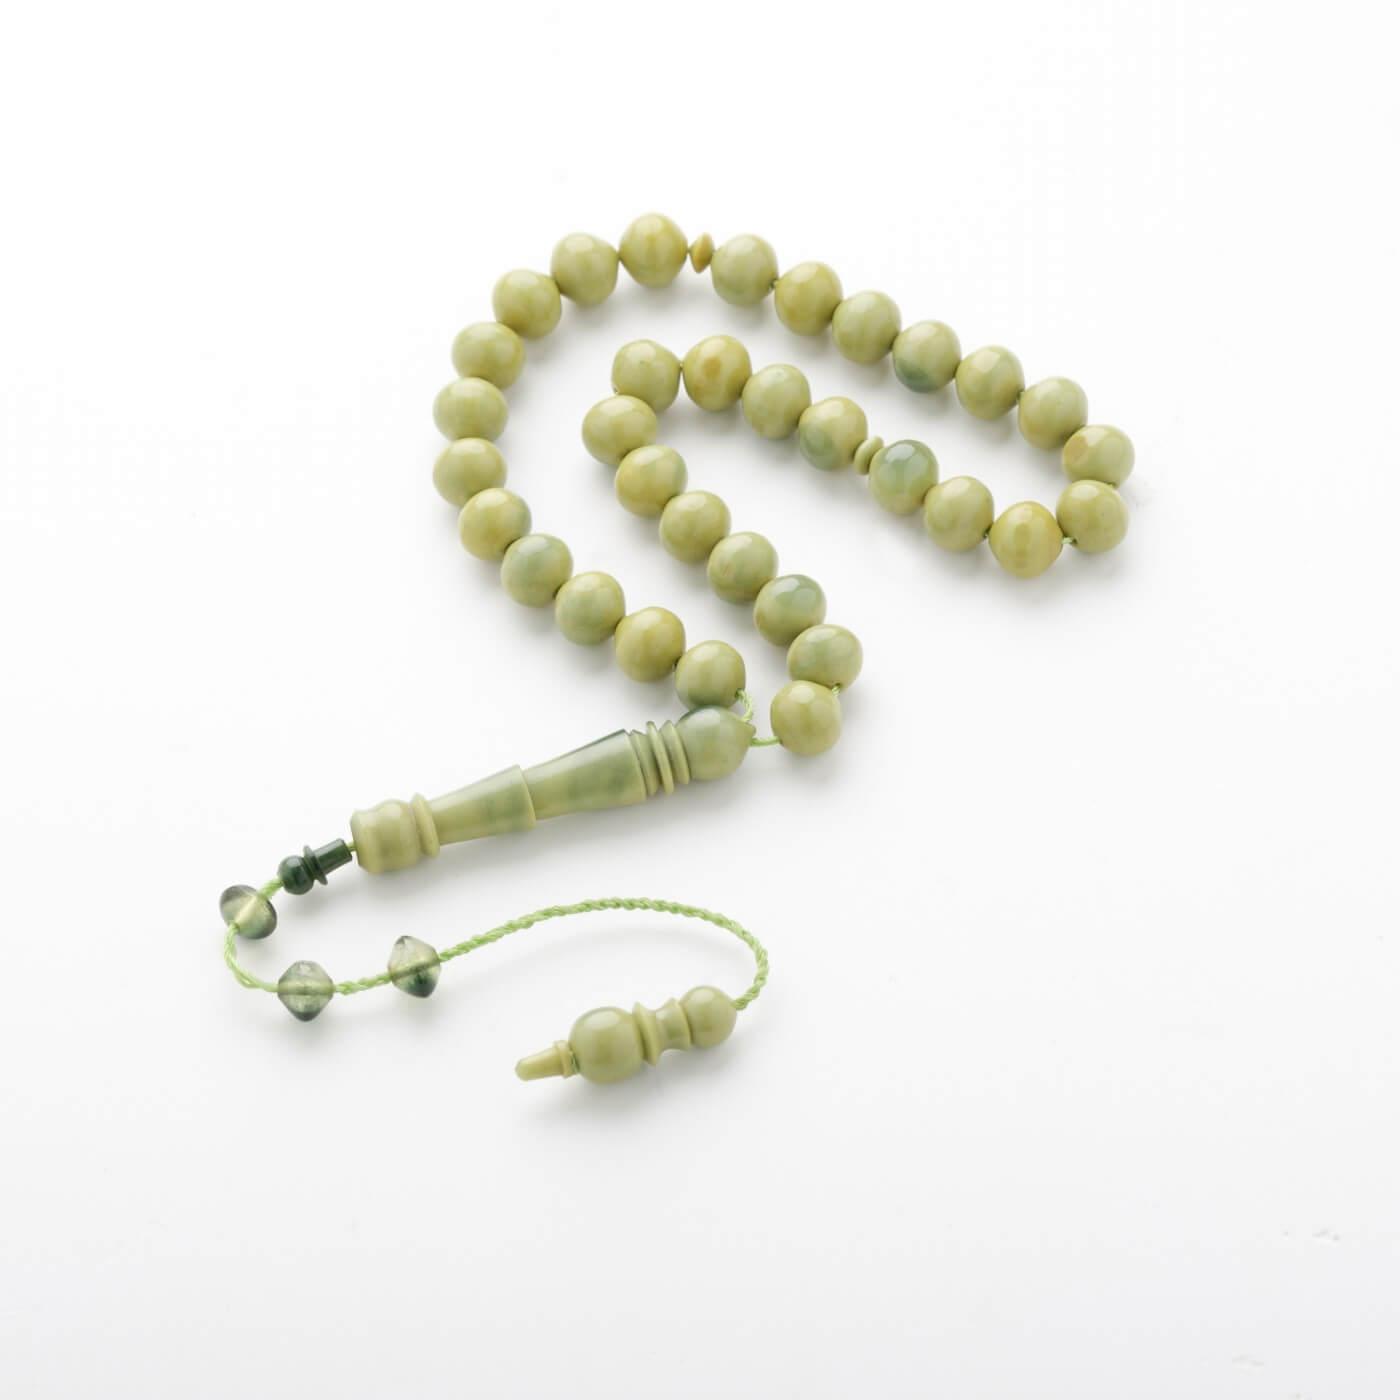 German Sandloos Prayer Beads